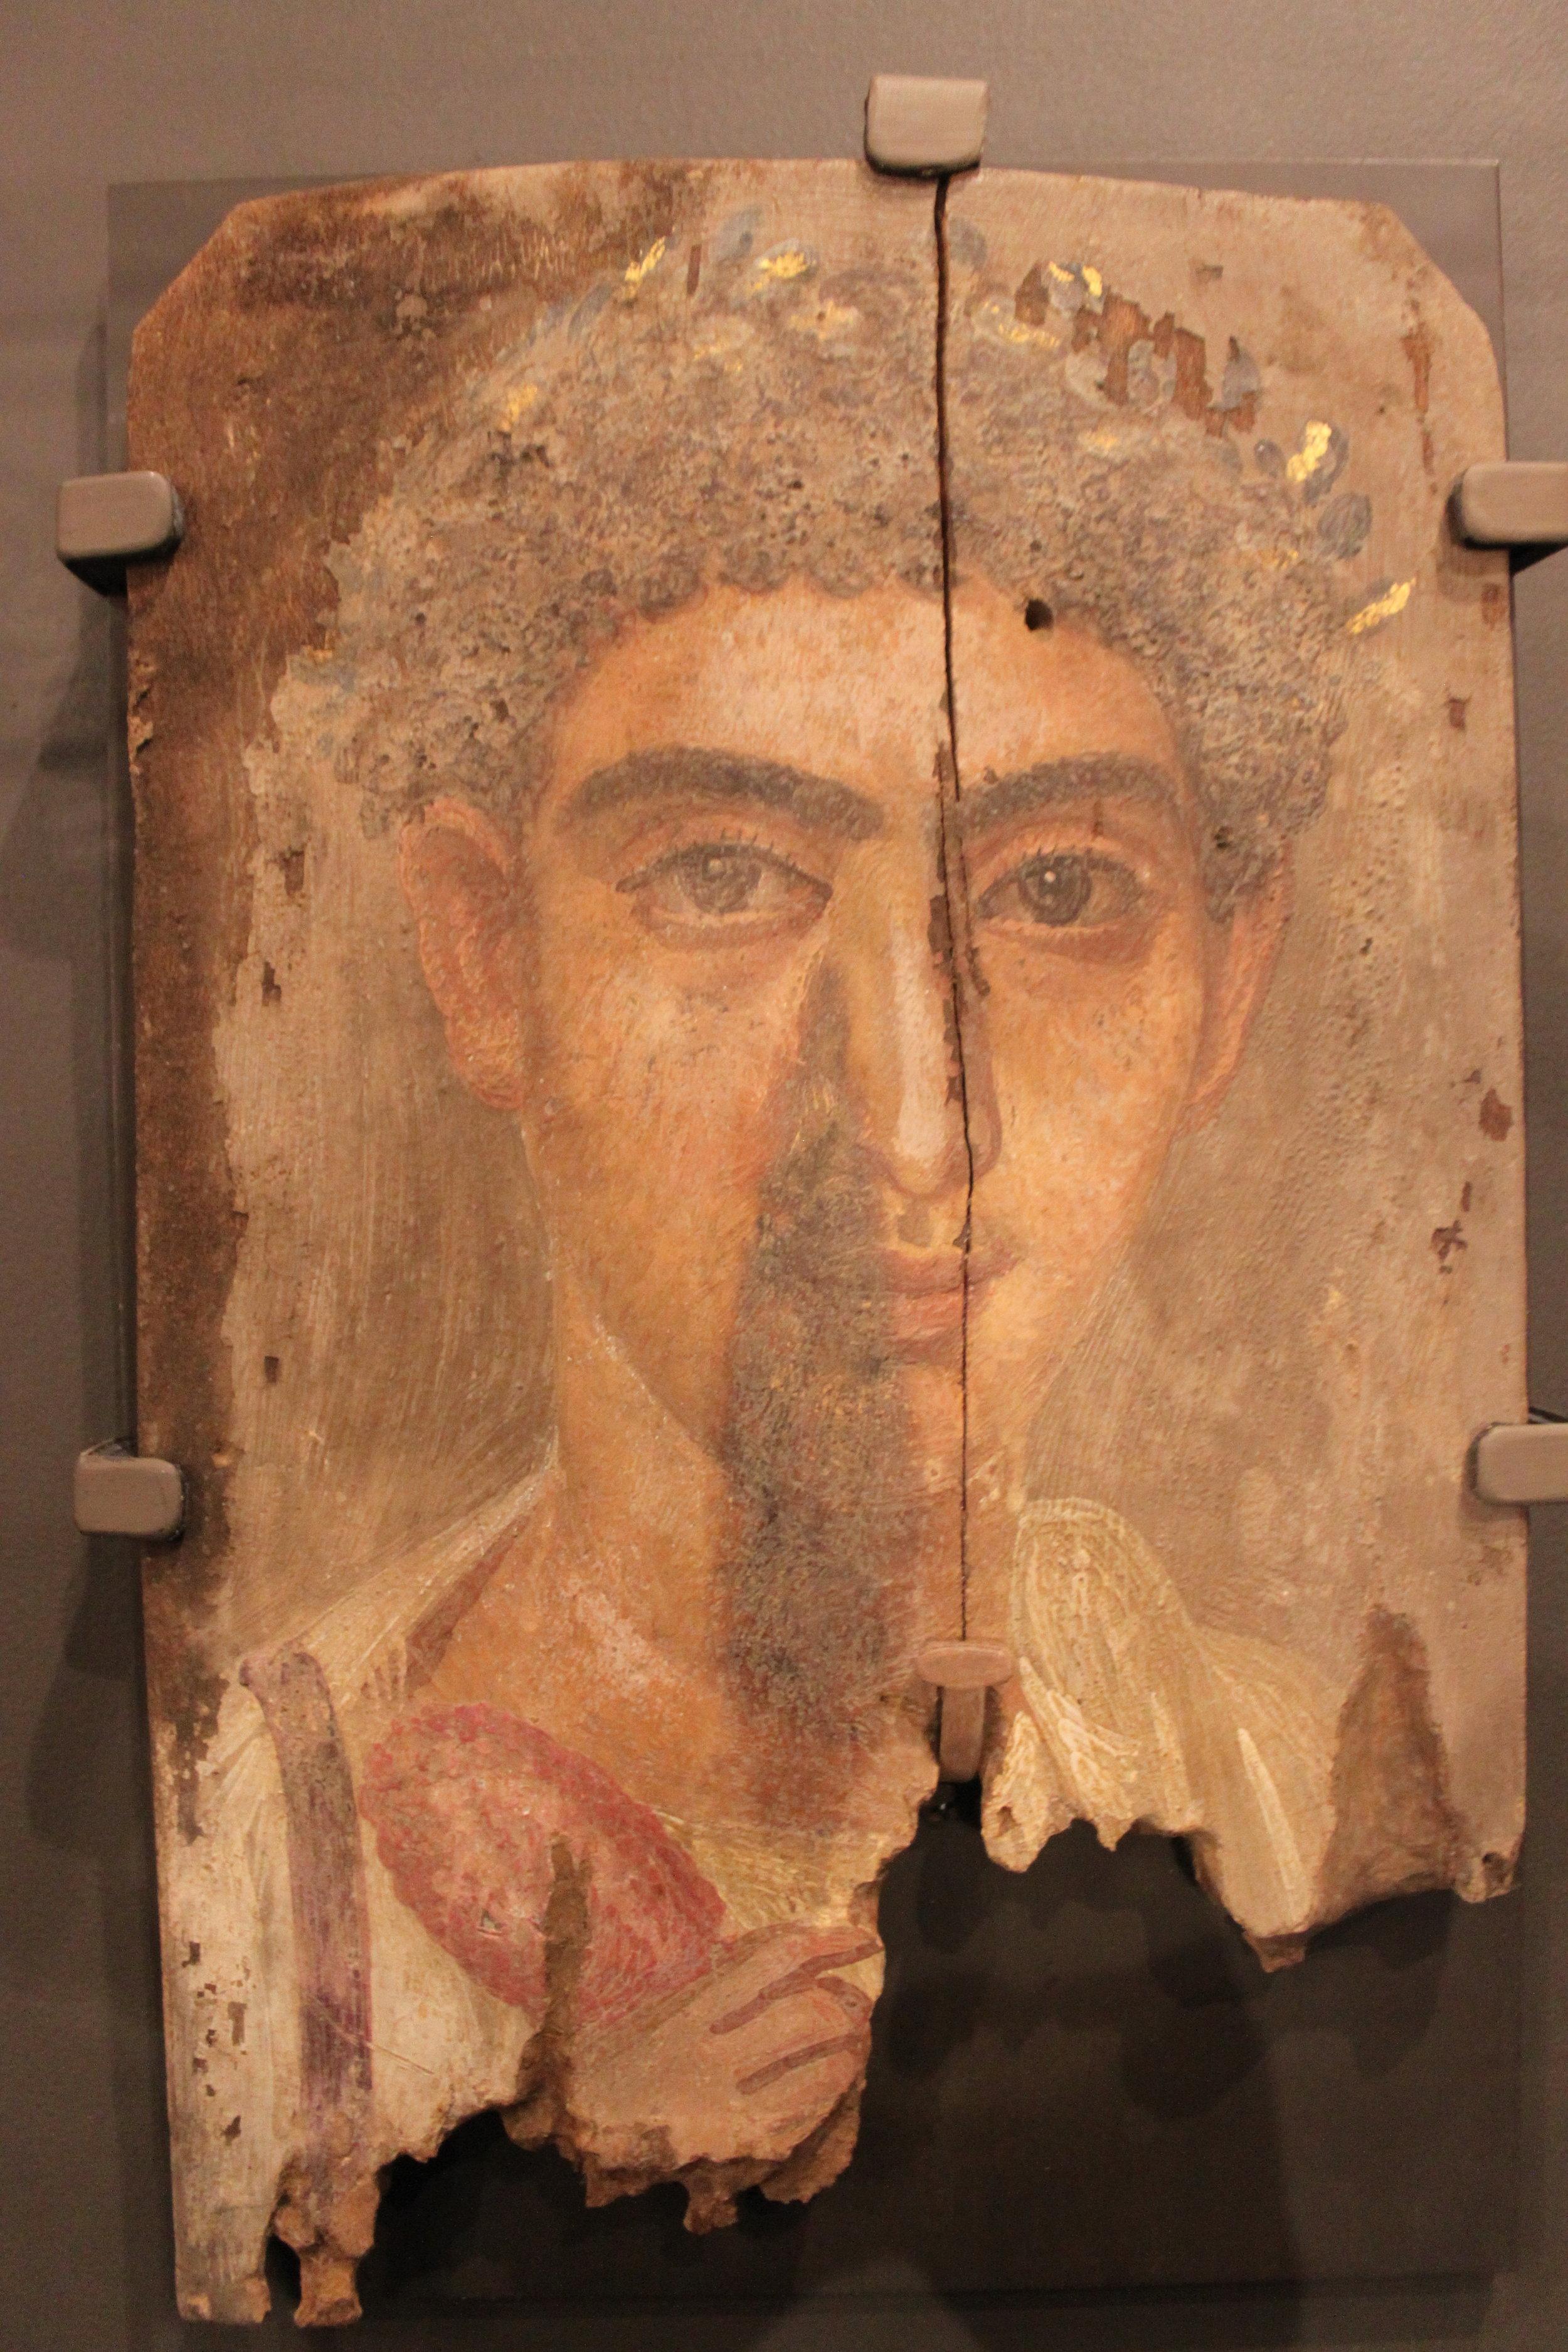 Mummy Portrait of a Man with a Wreath - Roman period (30 BCE  - 295 CE)